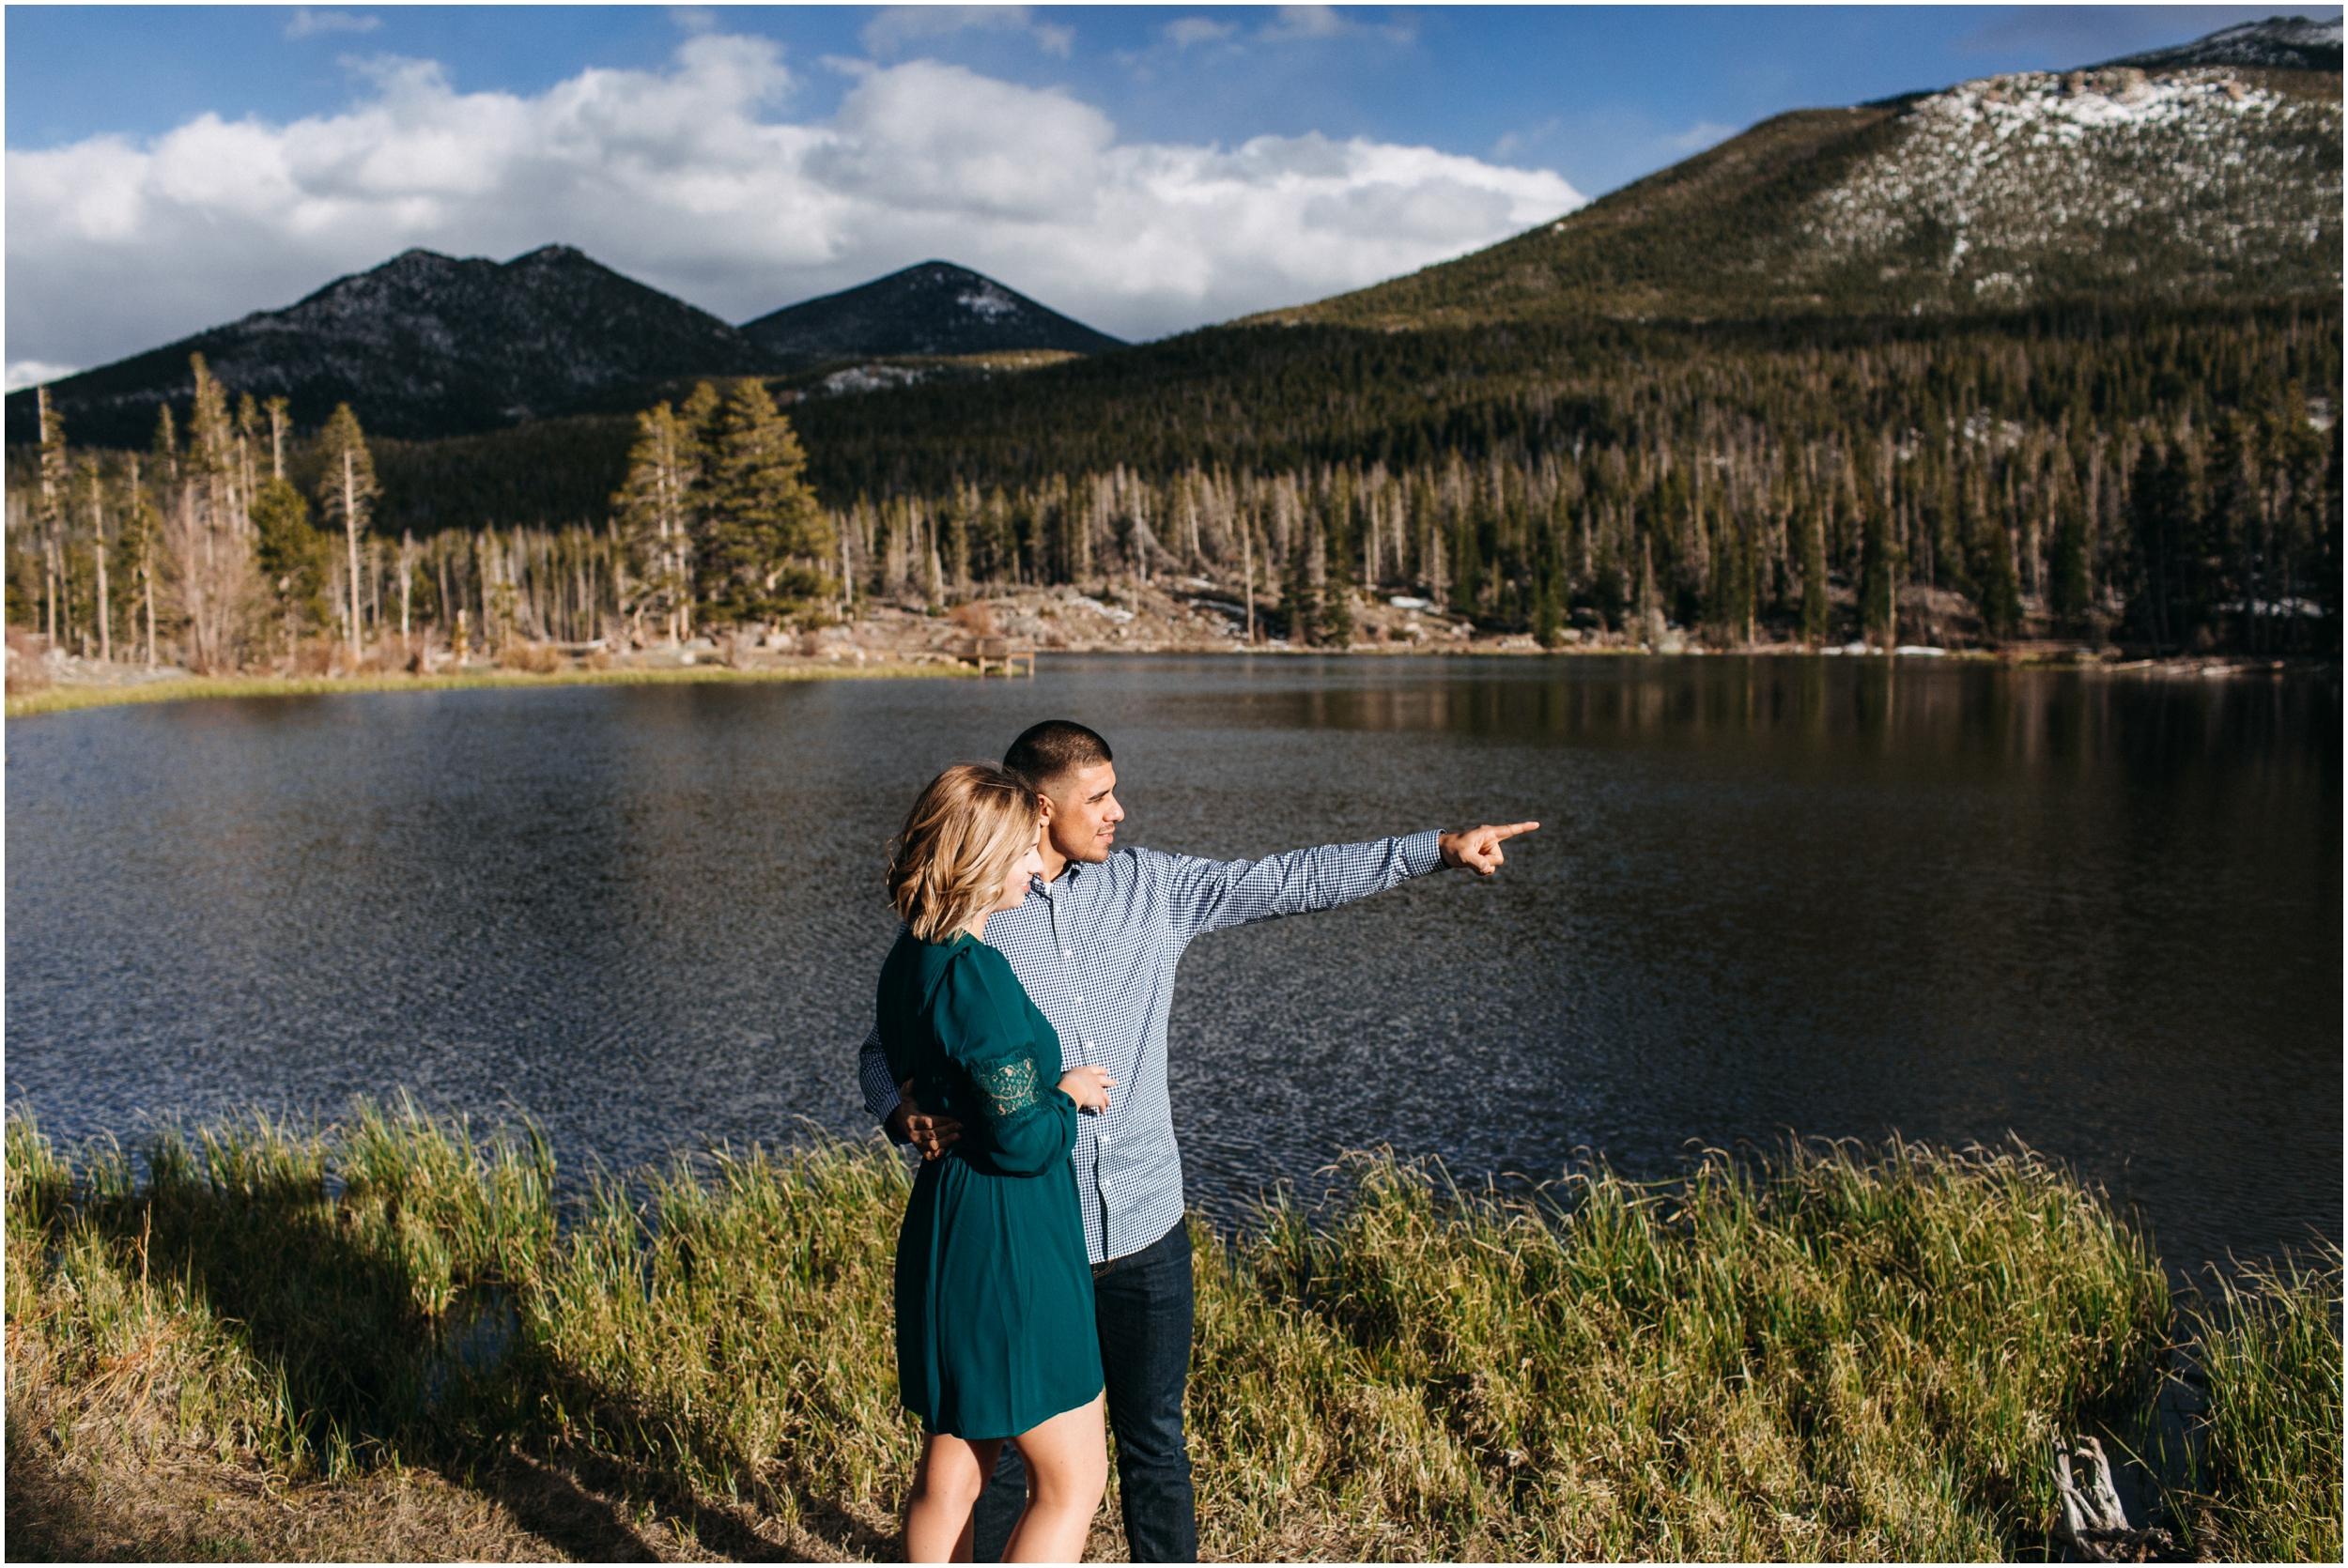 rocky-mountain-national-park-elopement-sprague-lake-colorado-adventure-wedding-photographer_taylor-powers_26.jpg